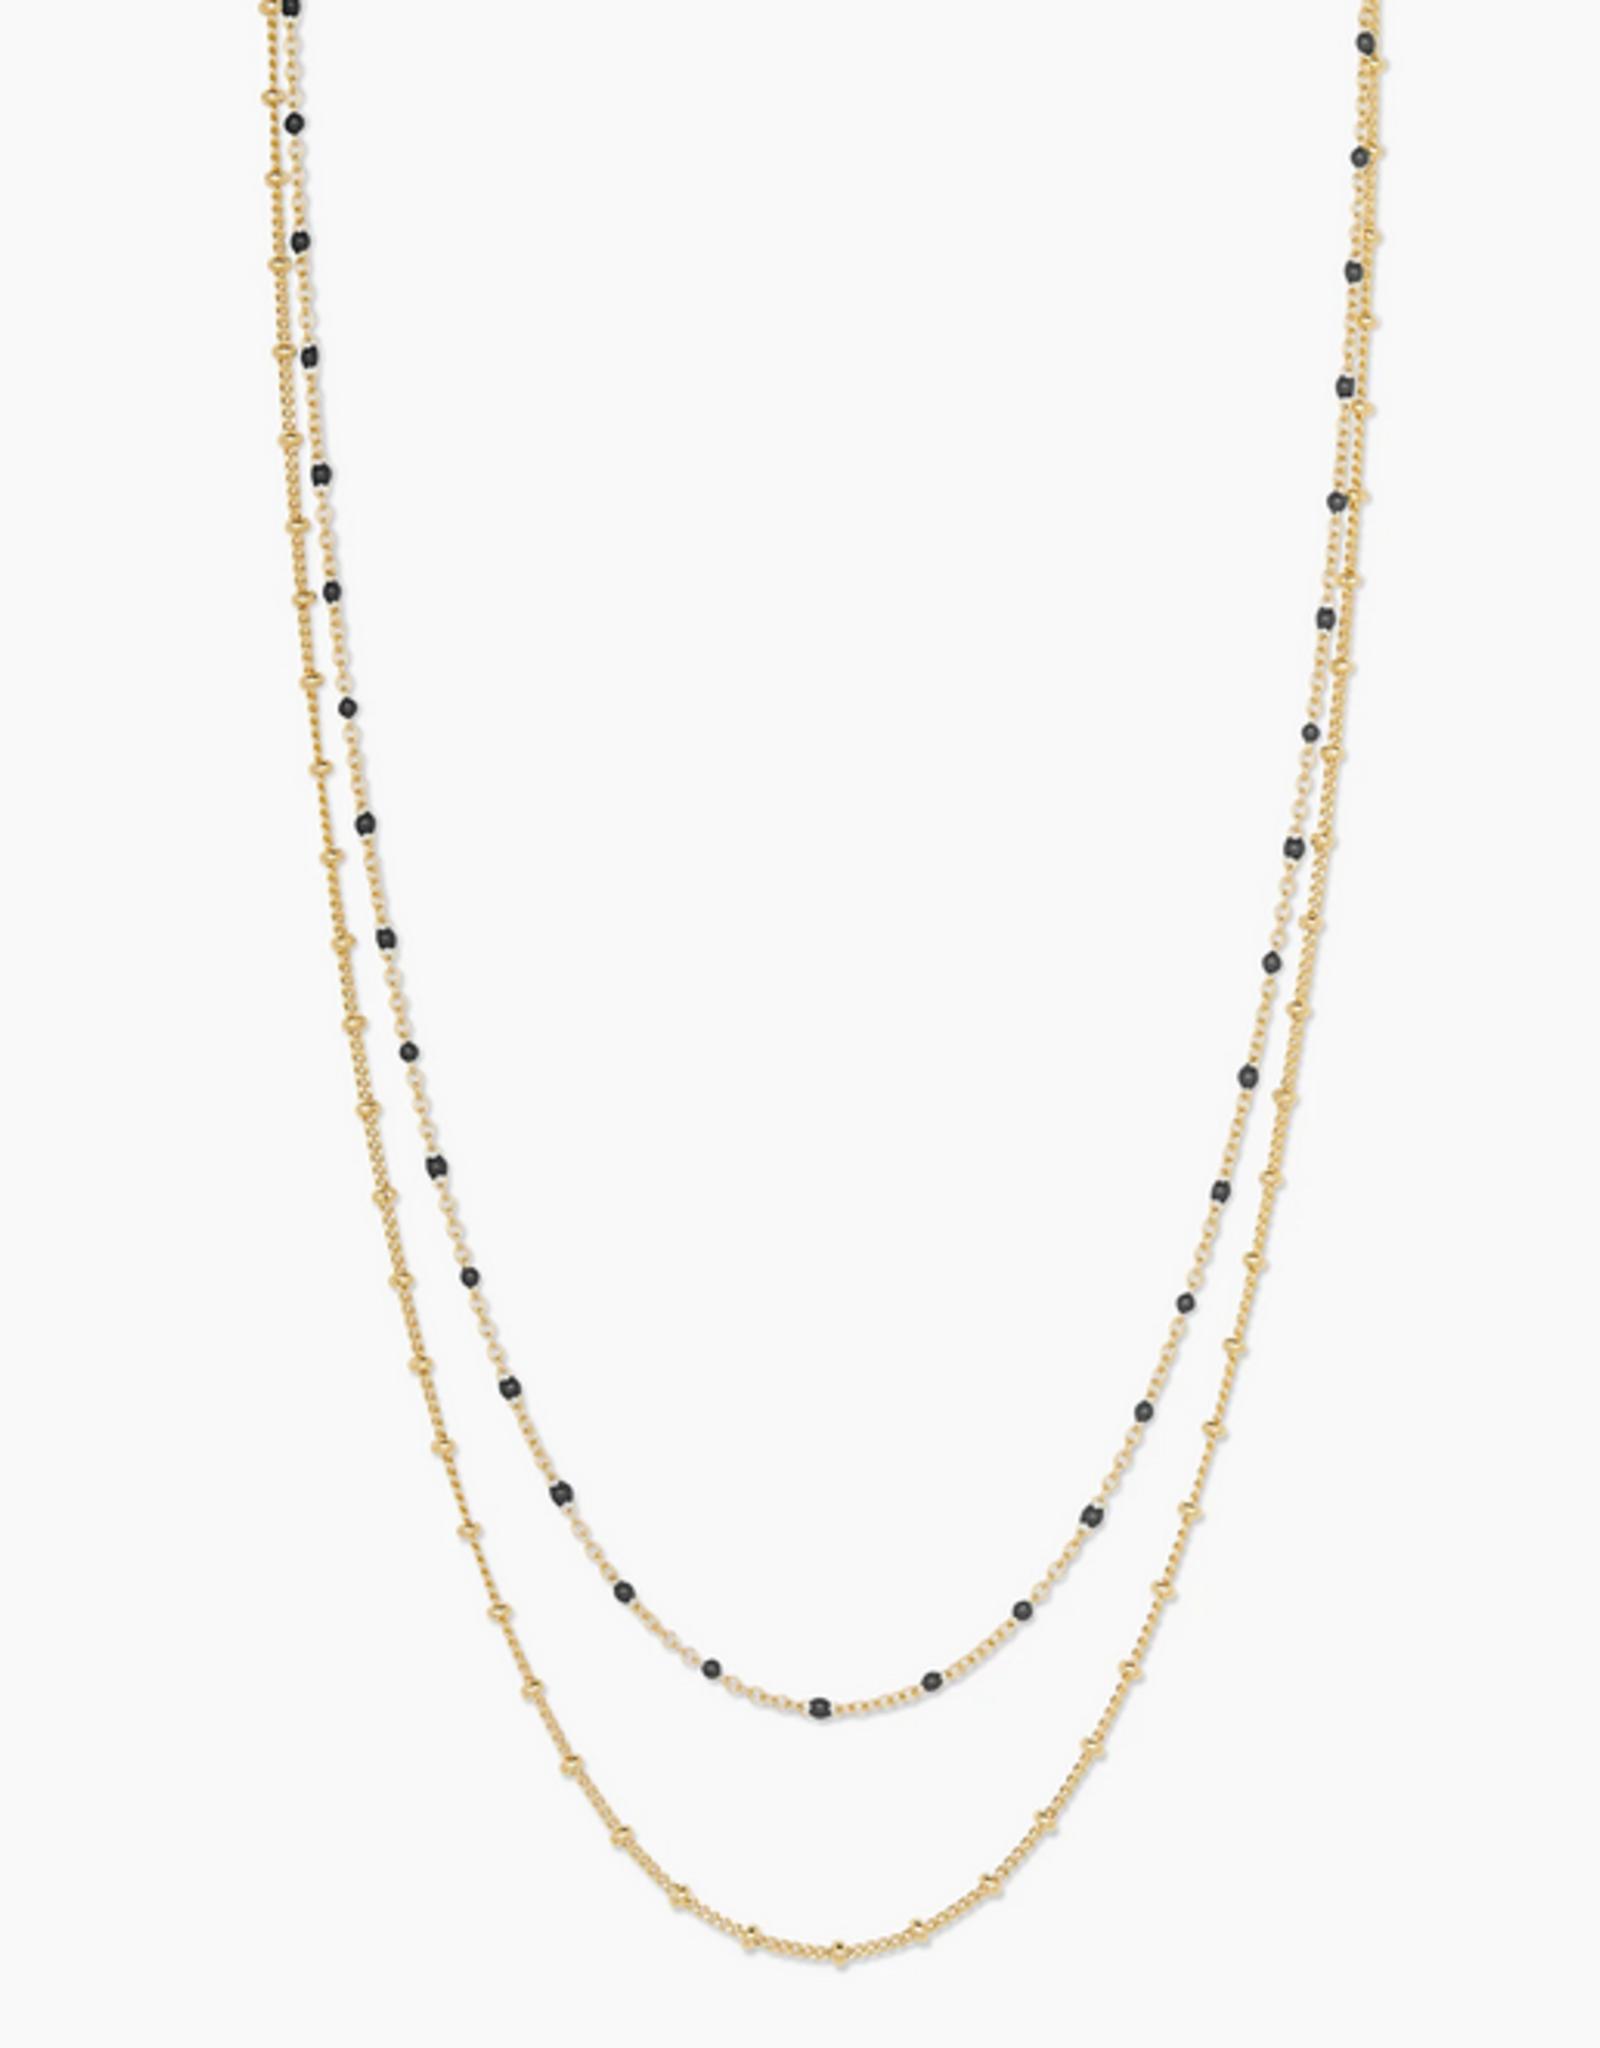 Gorjana Capri Layer Necklace